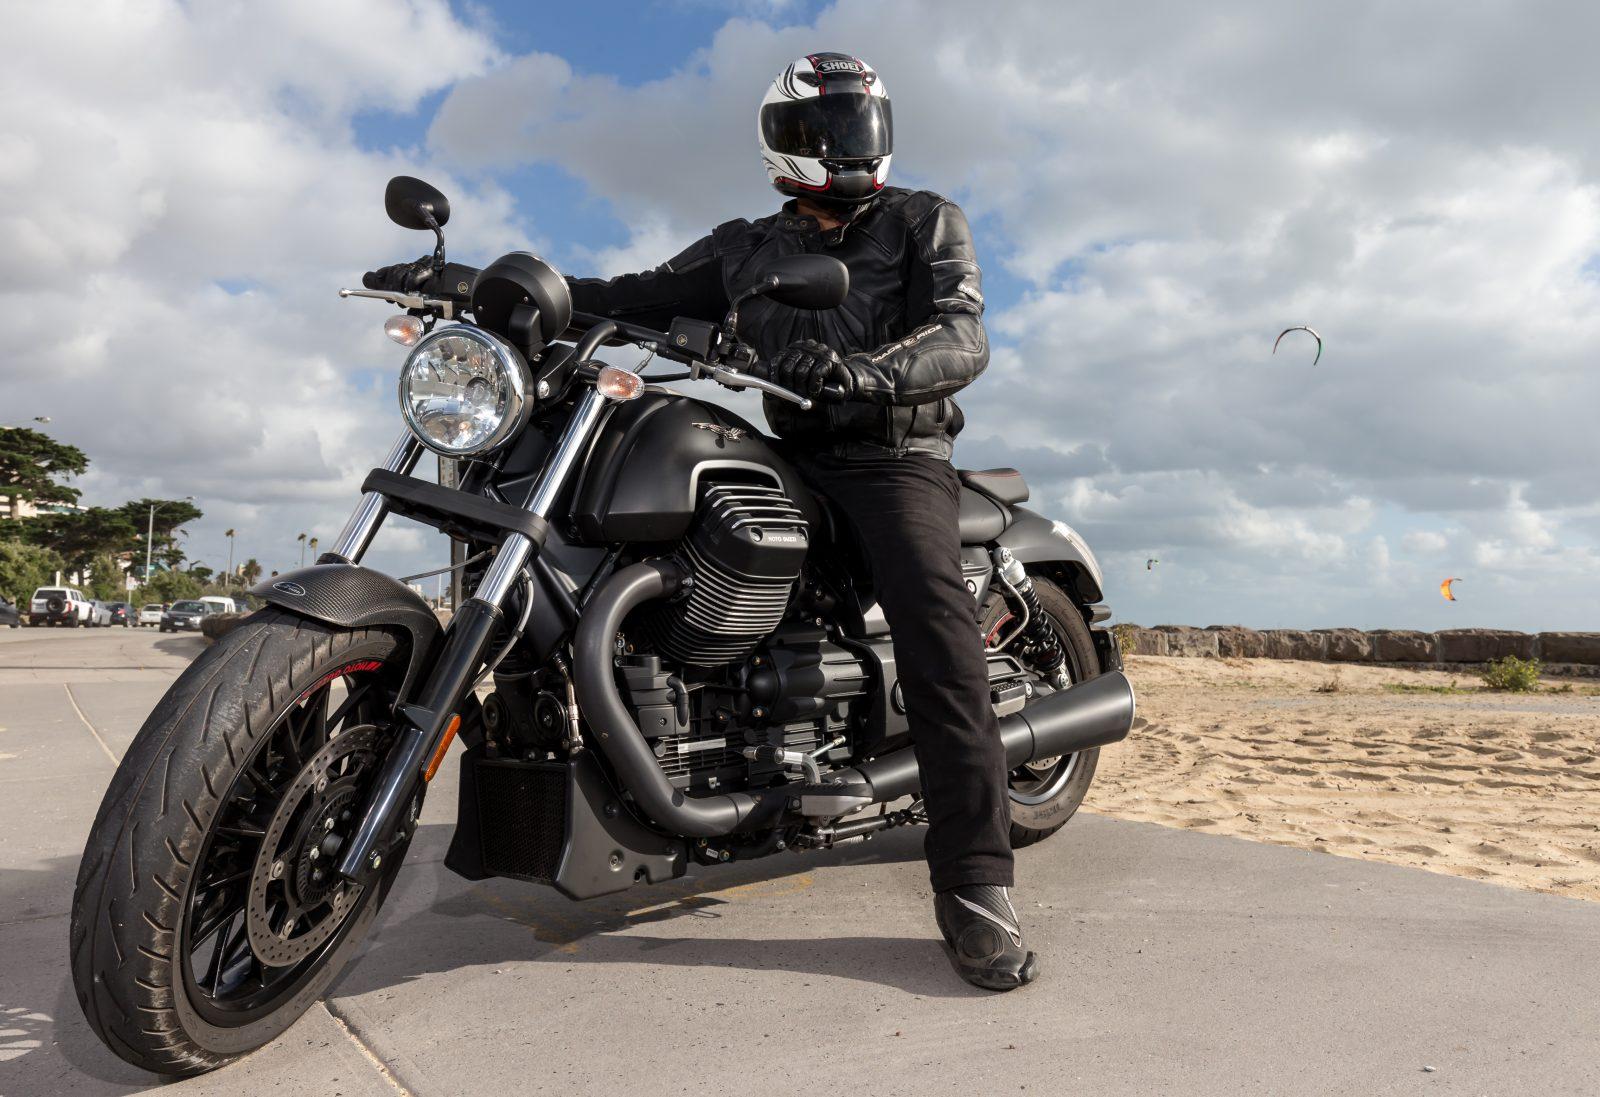 moto guzzi california audace australian motorcycle news. Black Bedroom Furniture Sets. Home Design Ideas